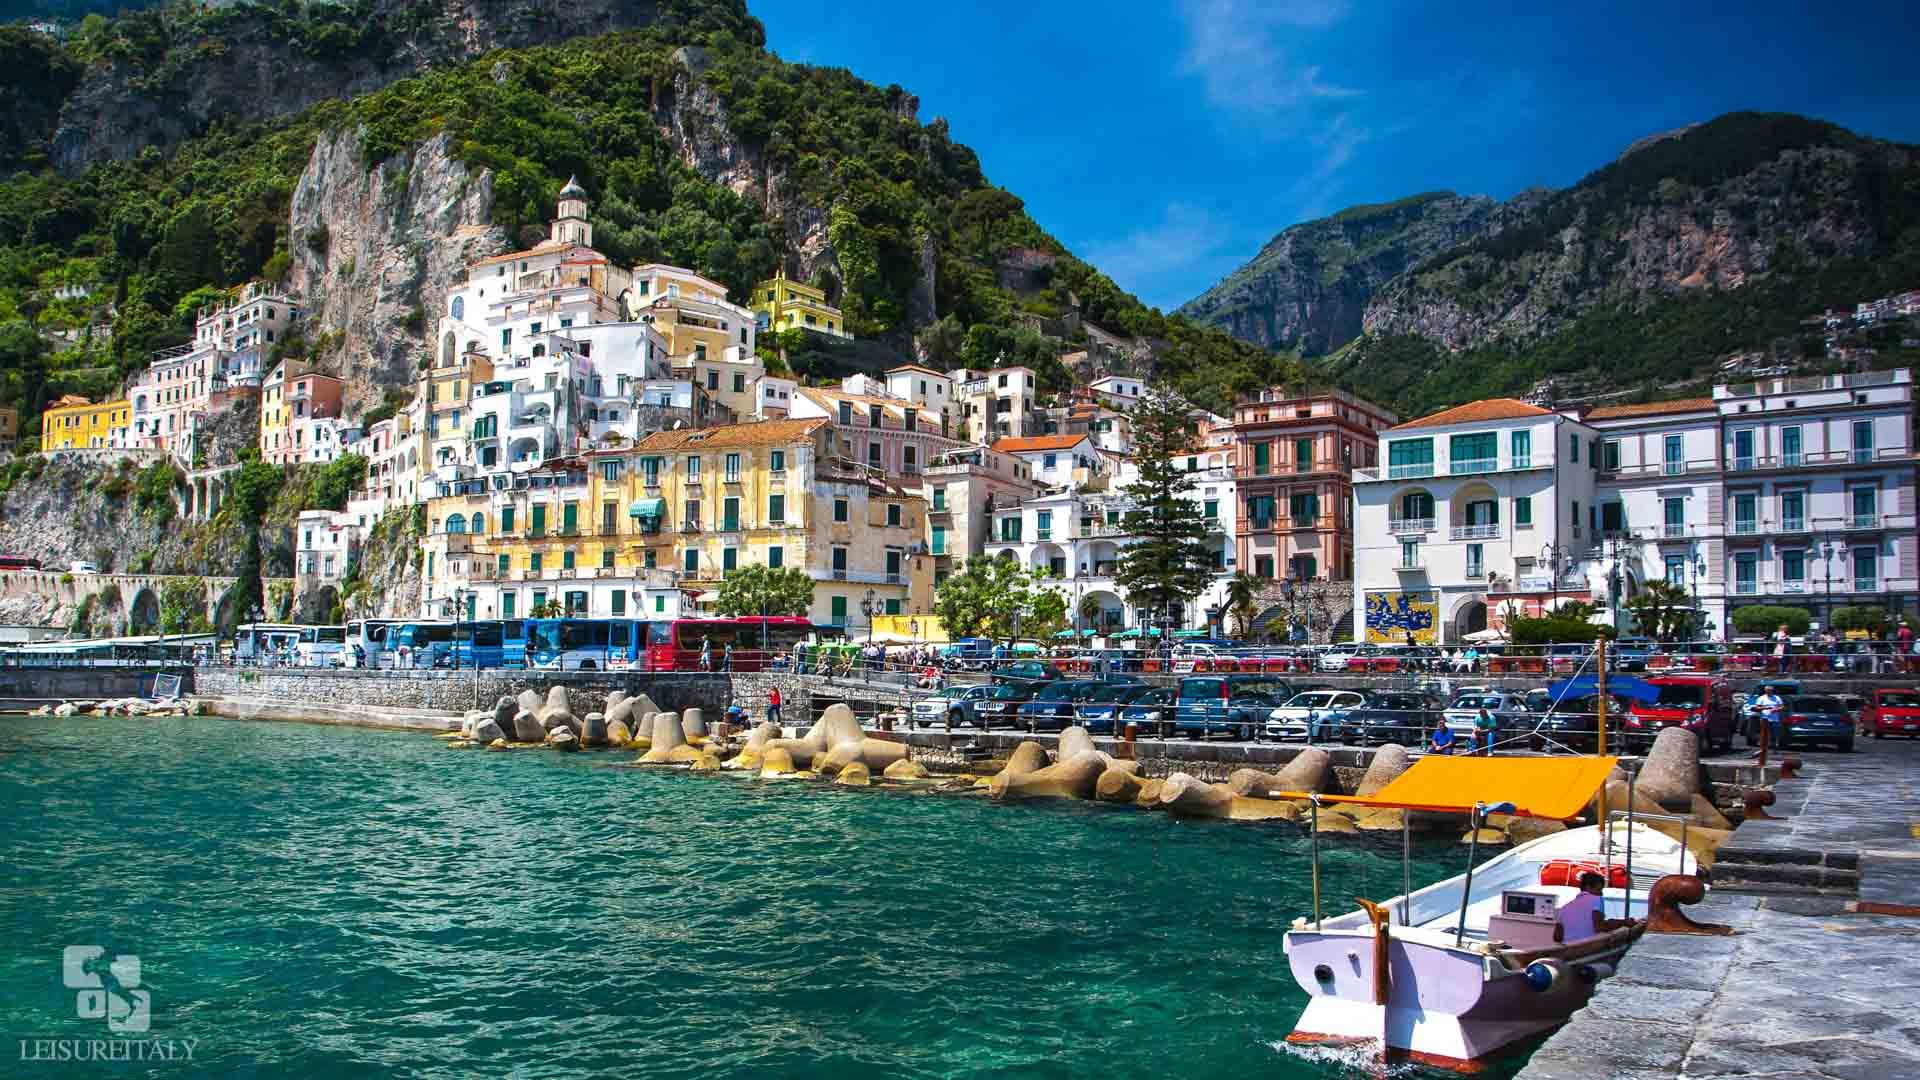 Amalfi Coast With Boat Experience Leisure Italy